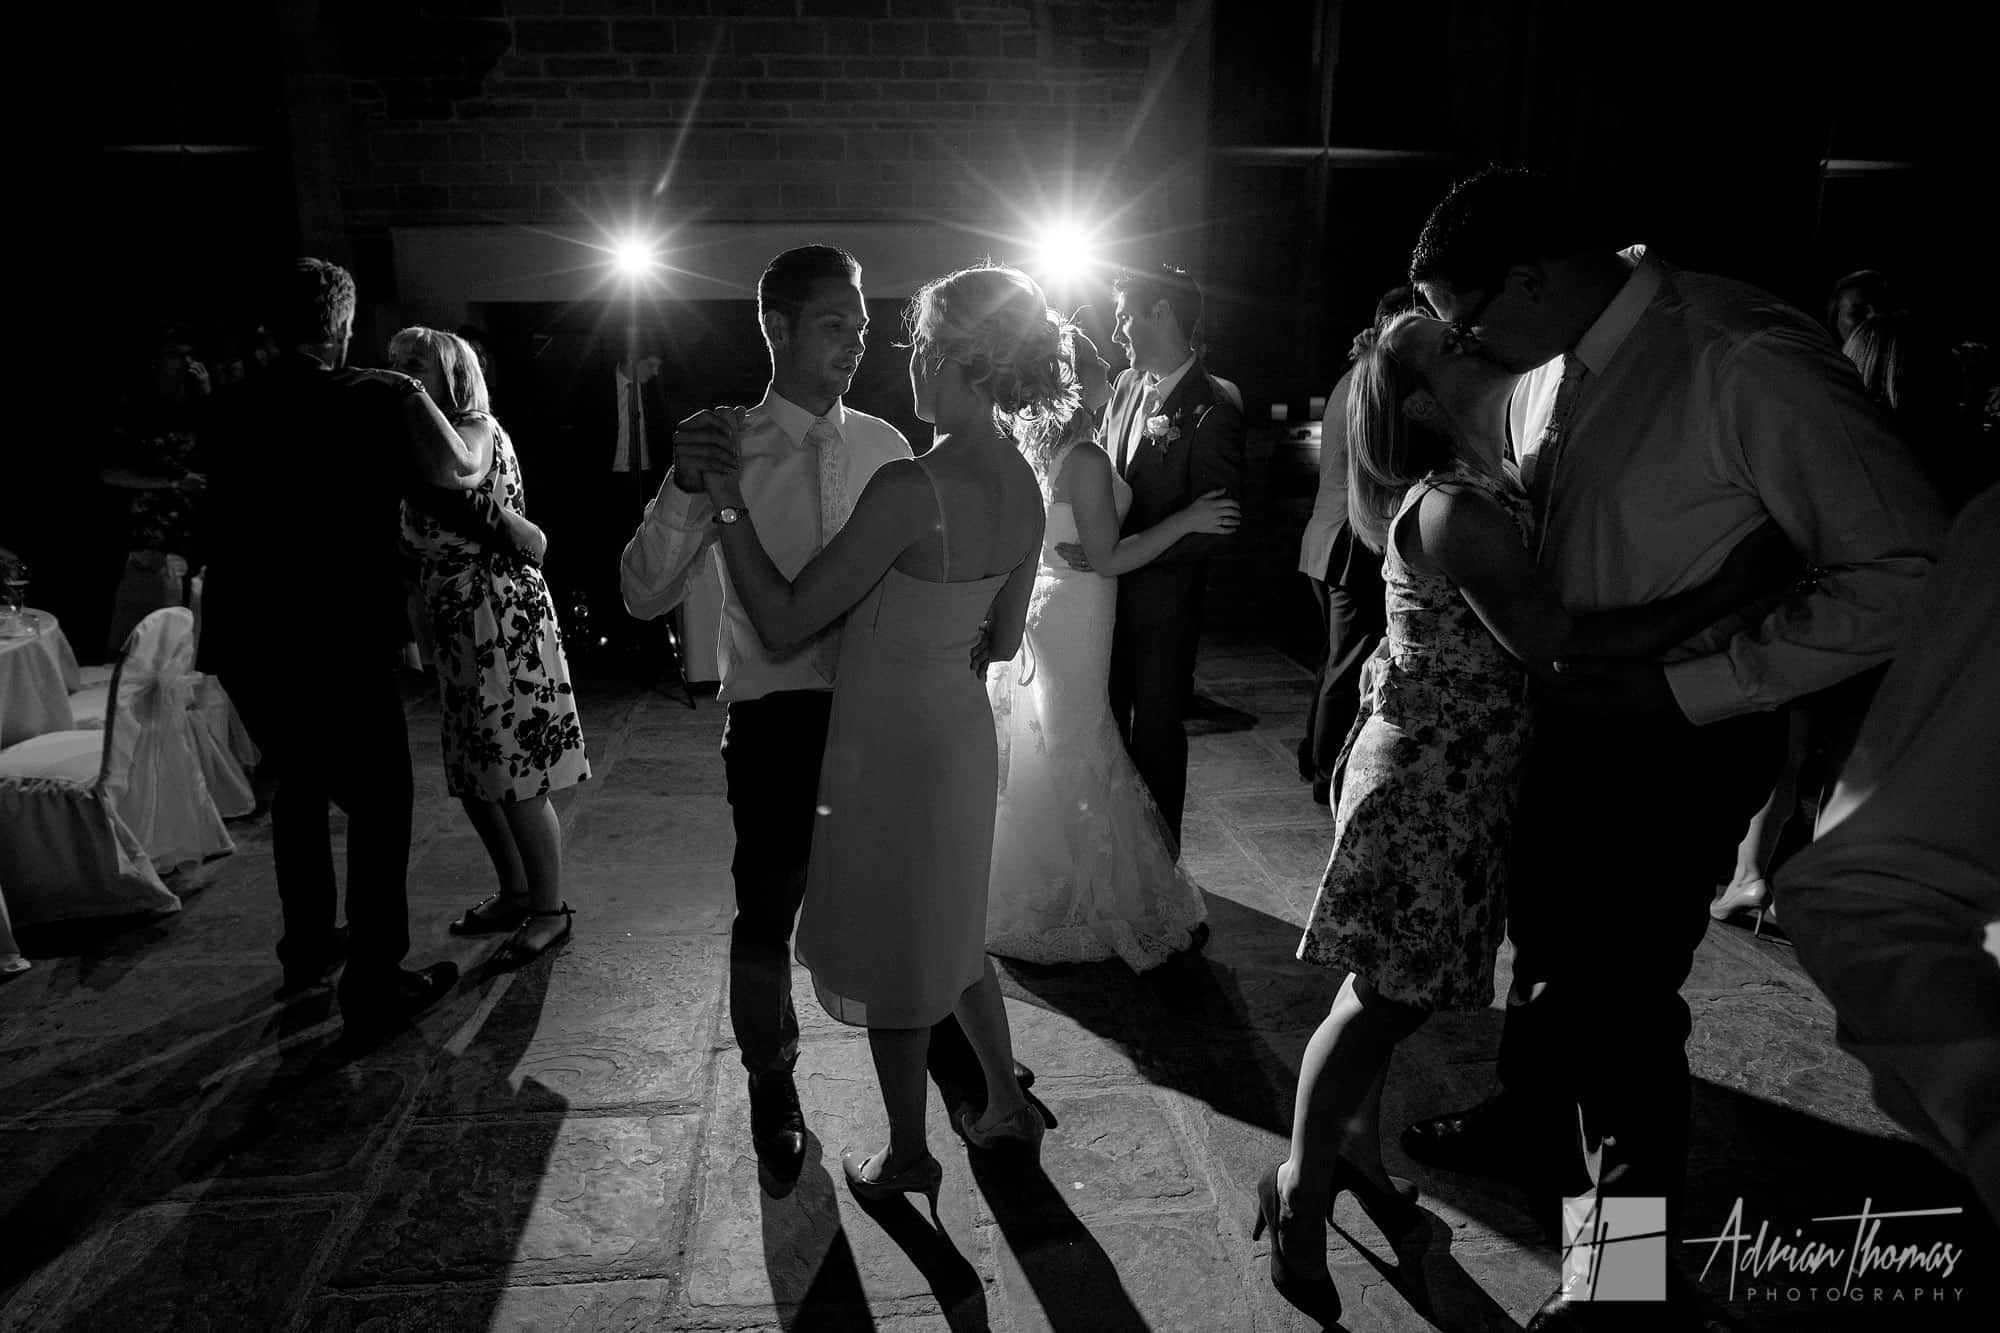 Guests slow dance.